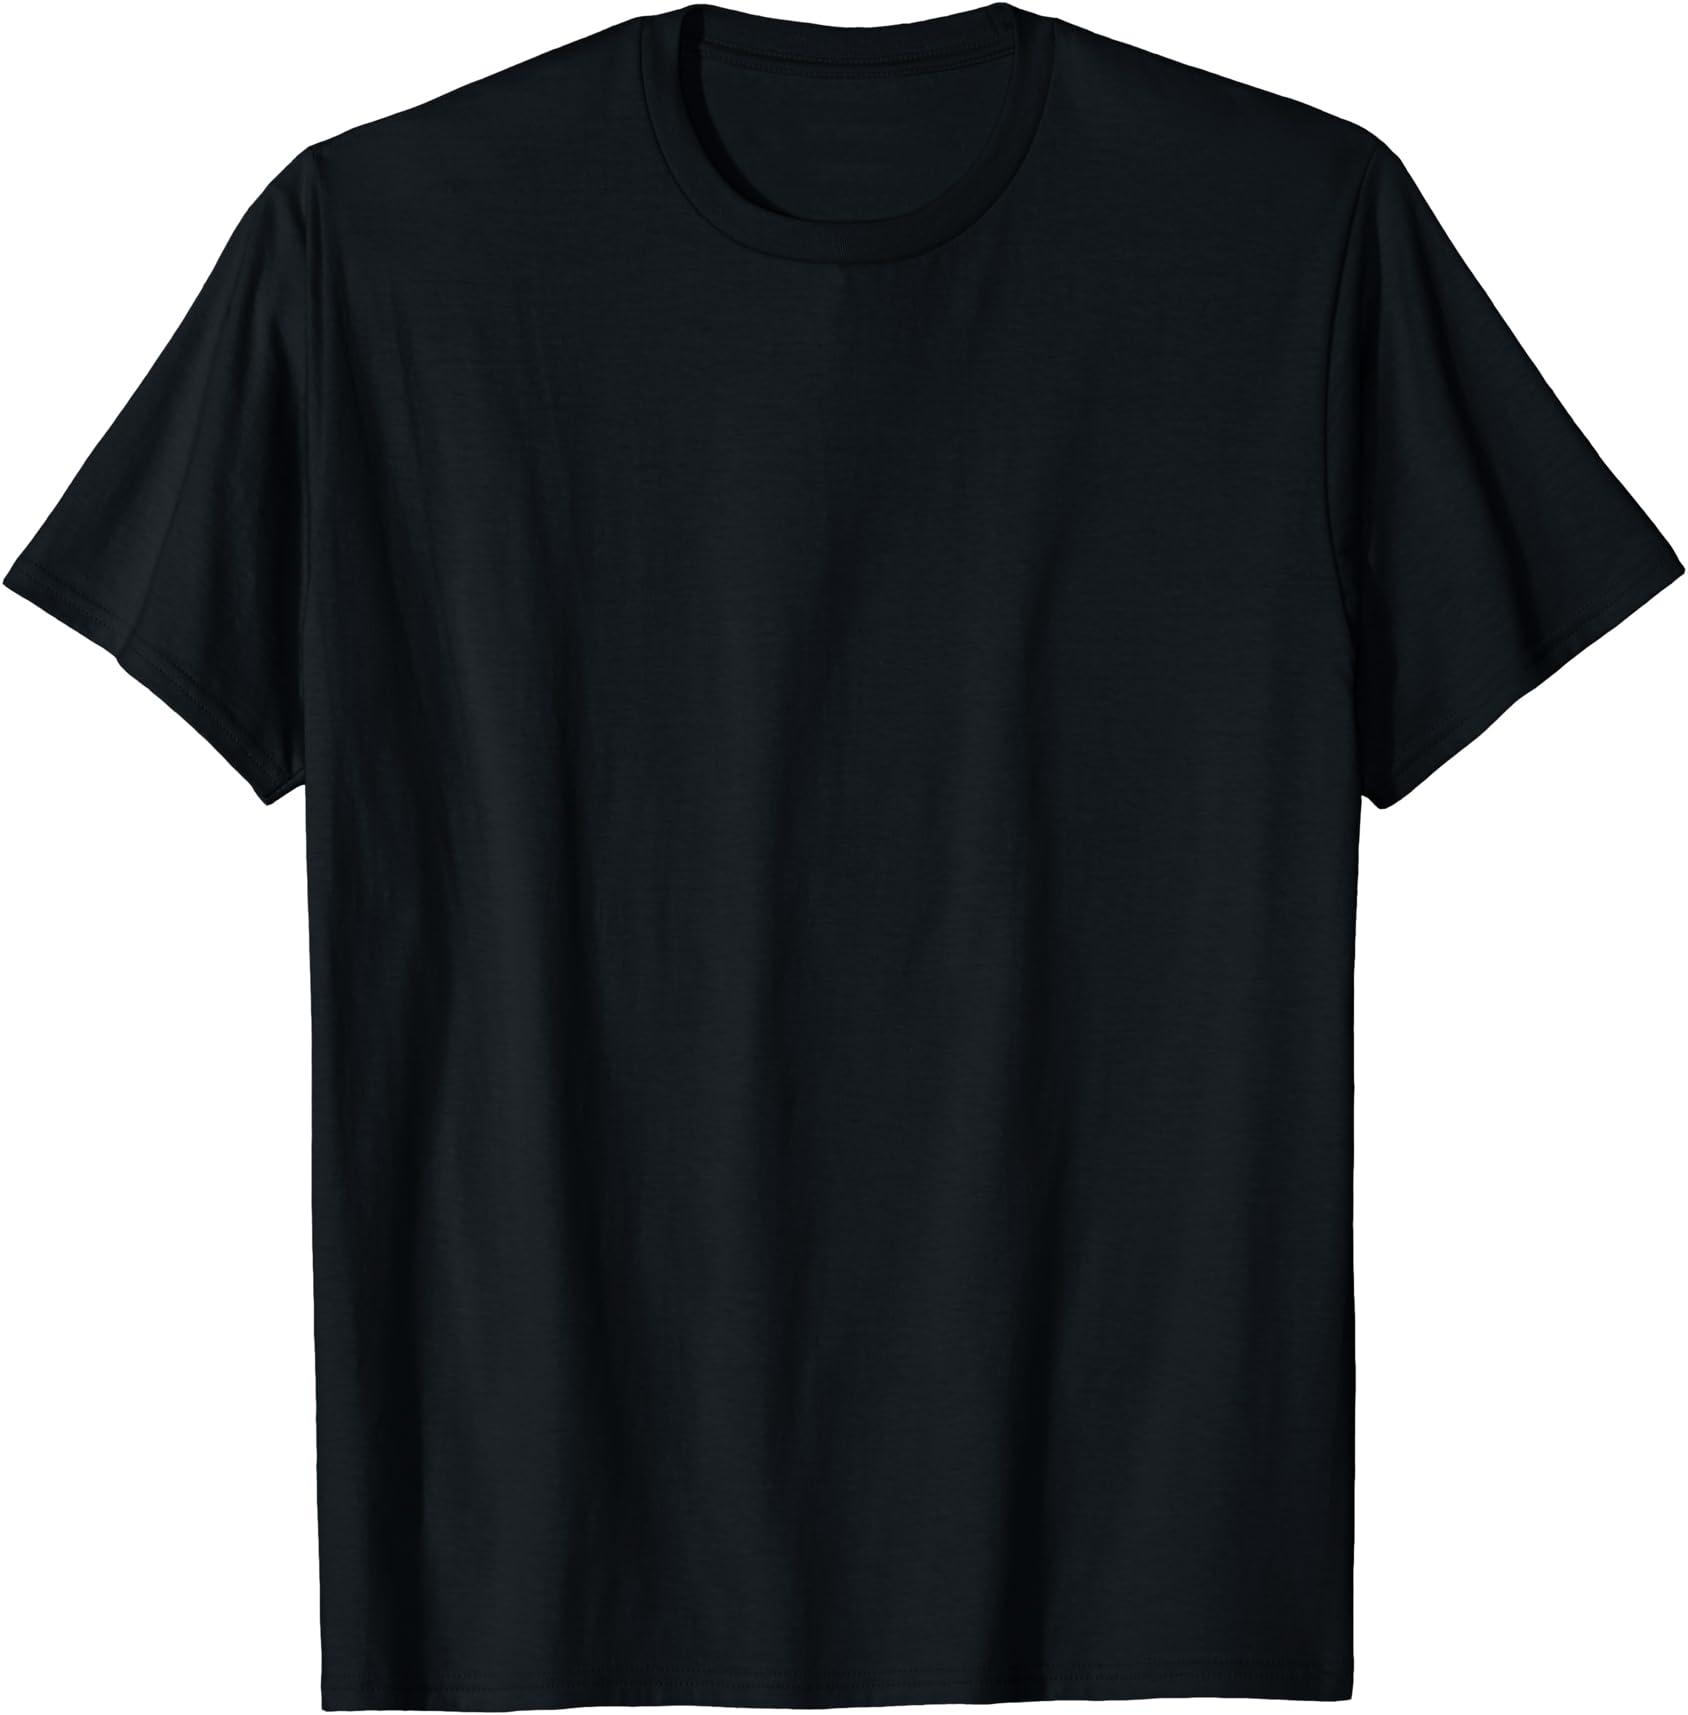 Nursing is in The Heart Unisex T-Shirt